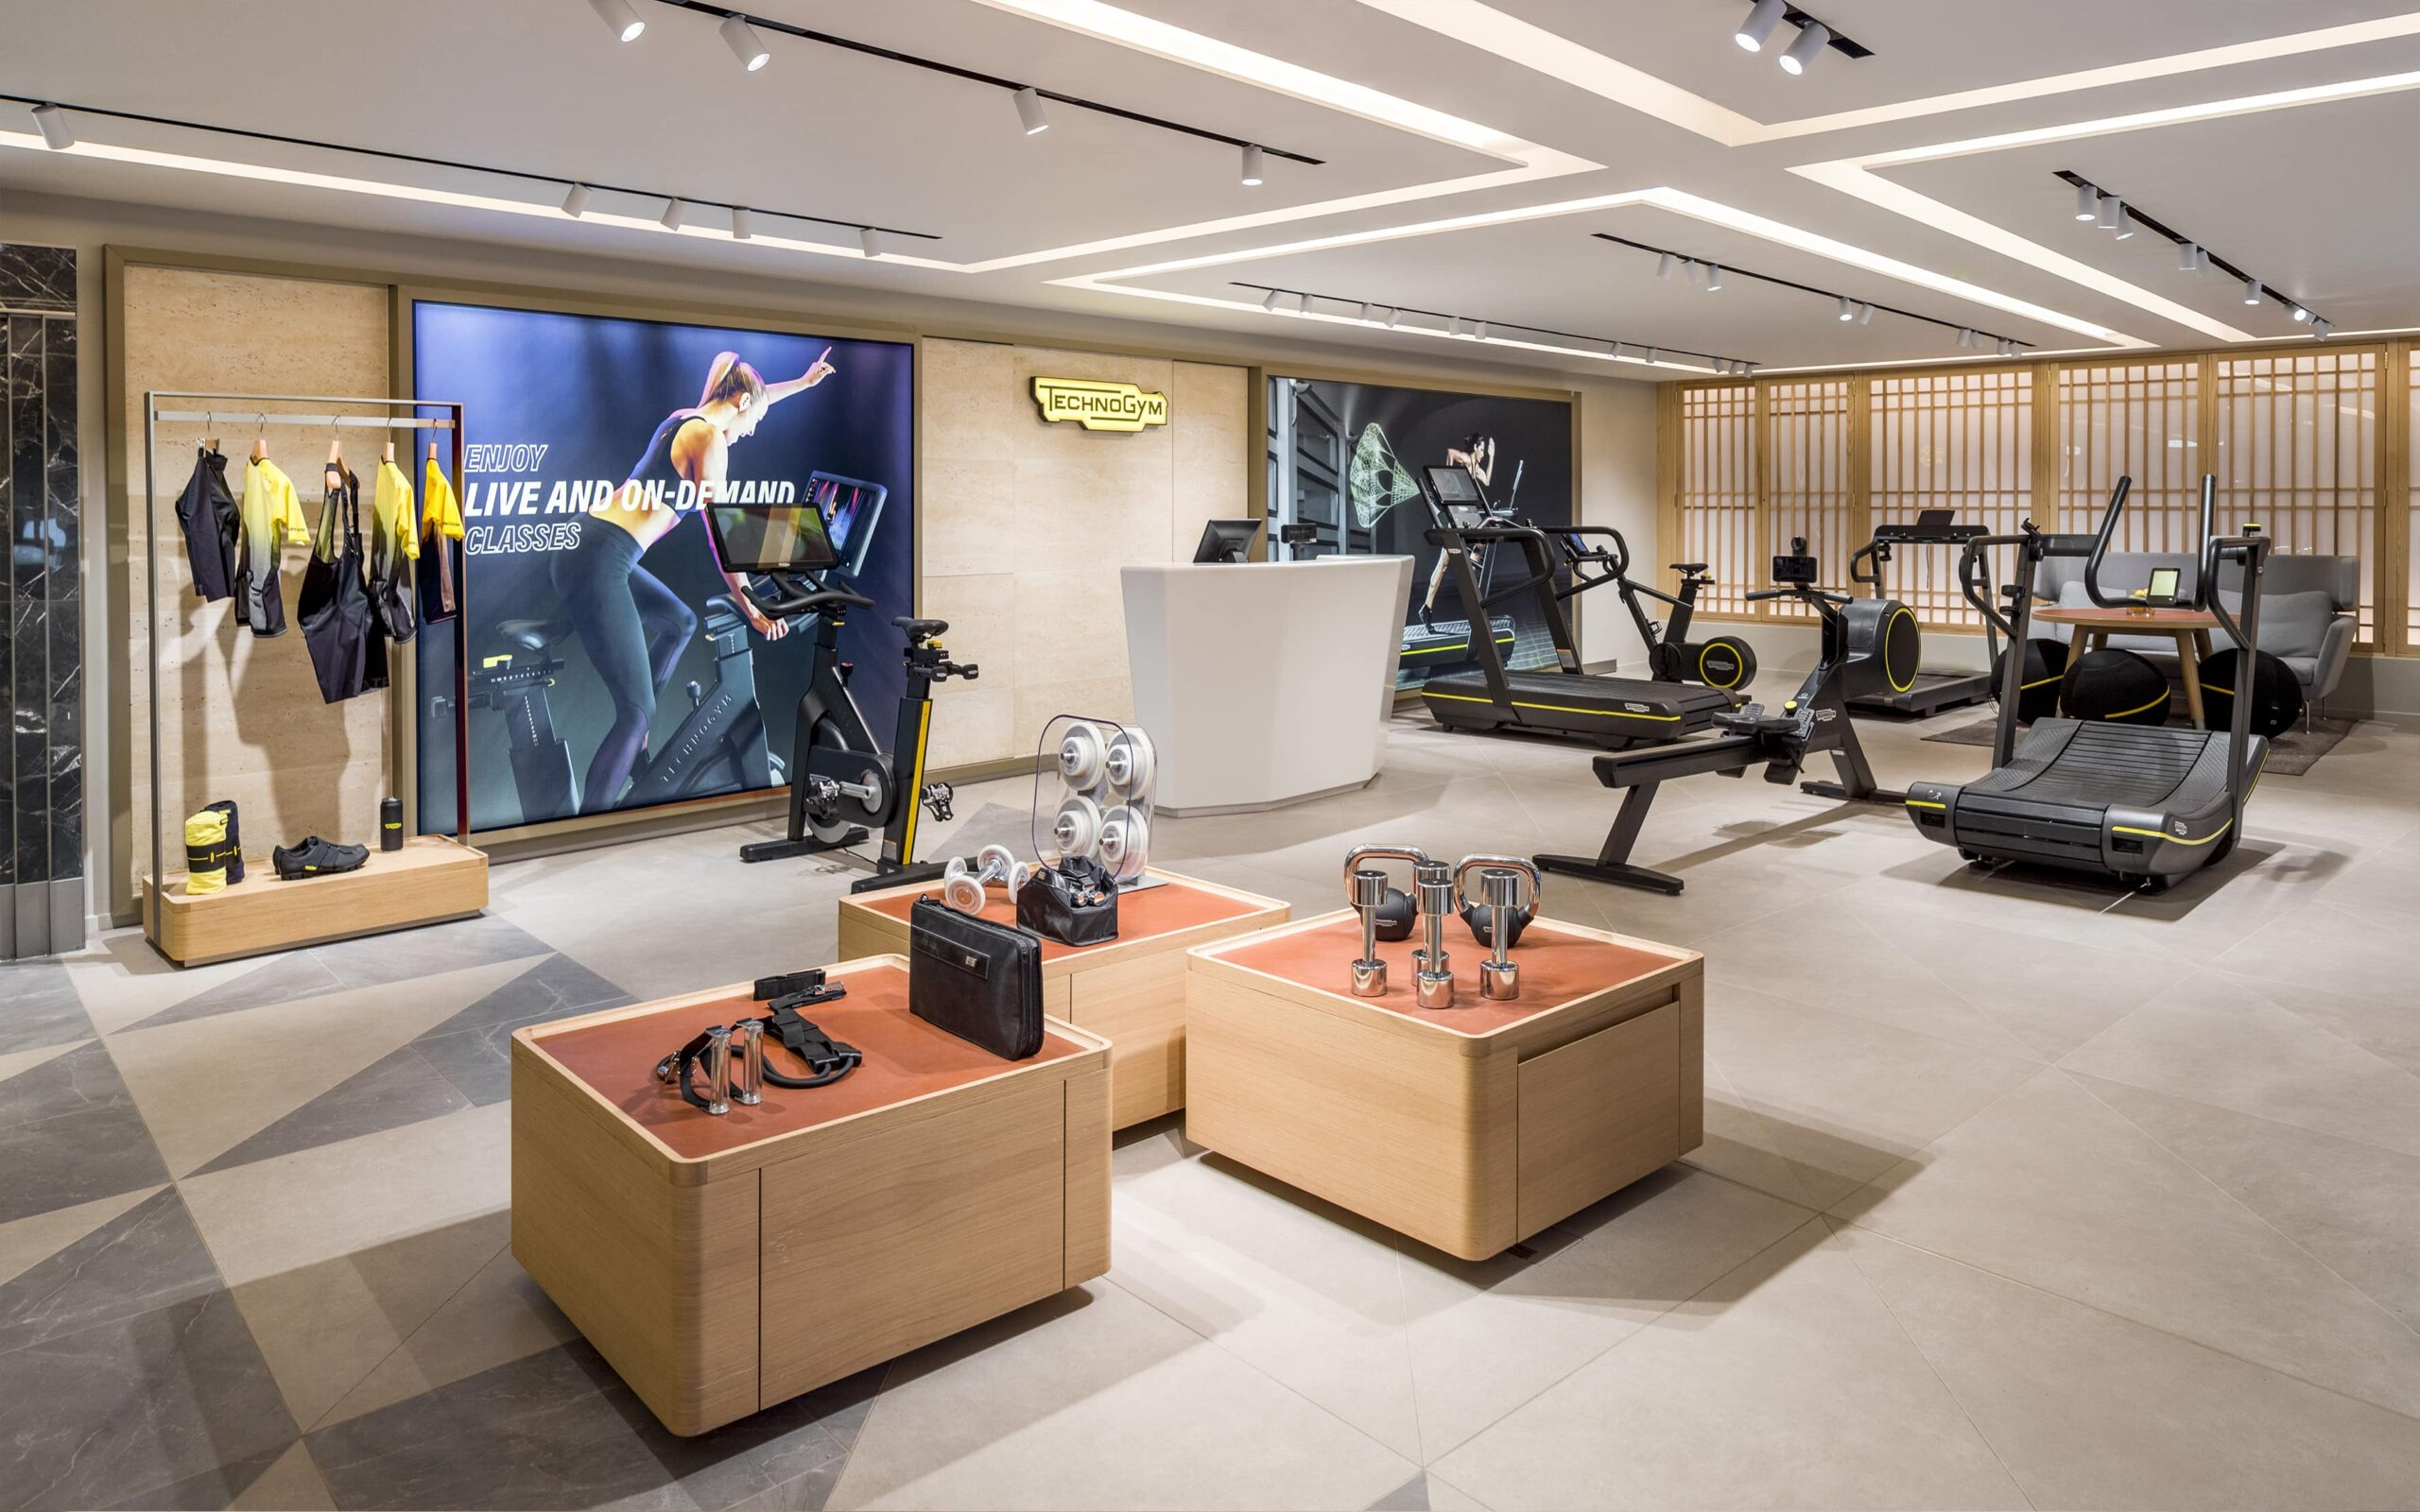 Technogym porta il wellness a Zurigo